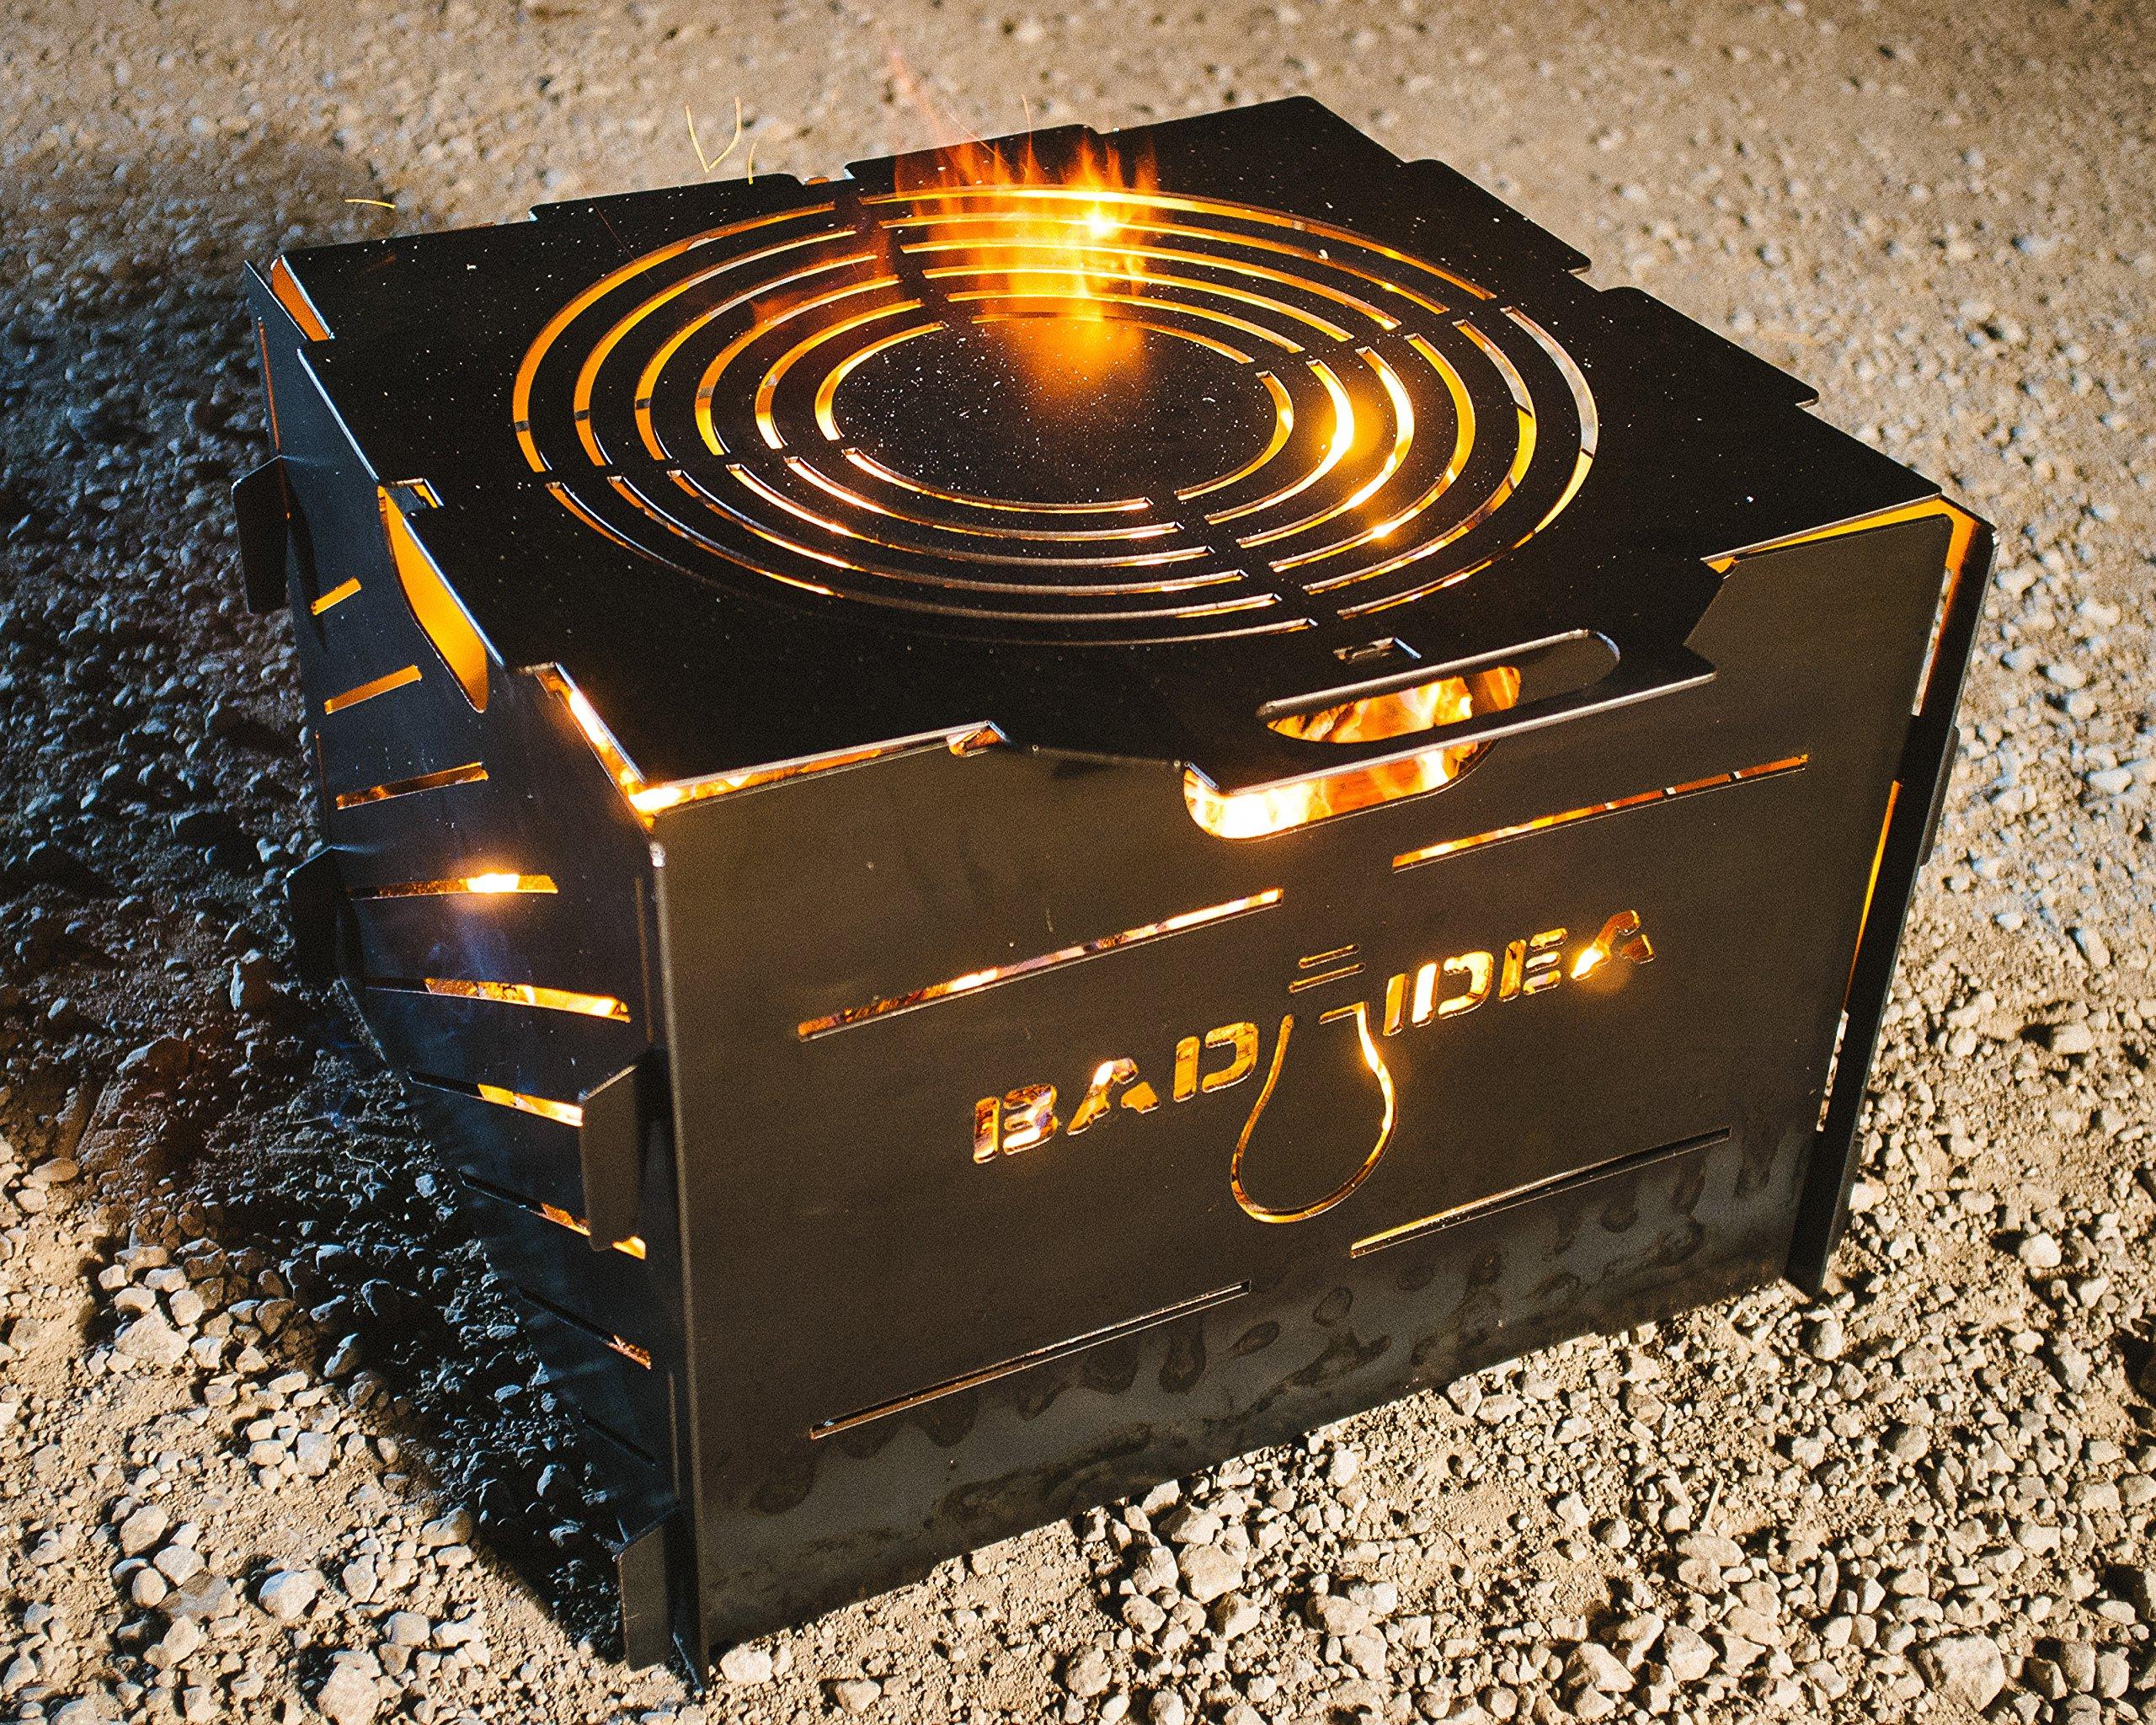 Blaze Burn Cage Portable Fire Pit Camp Stove